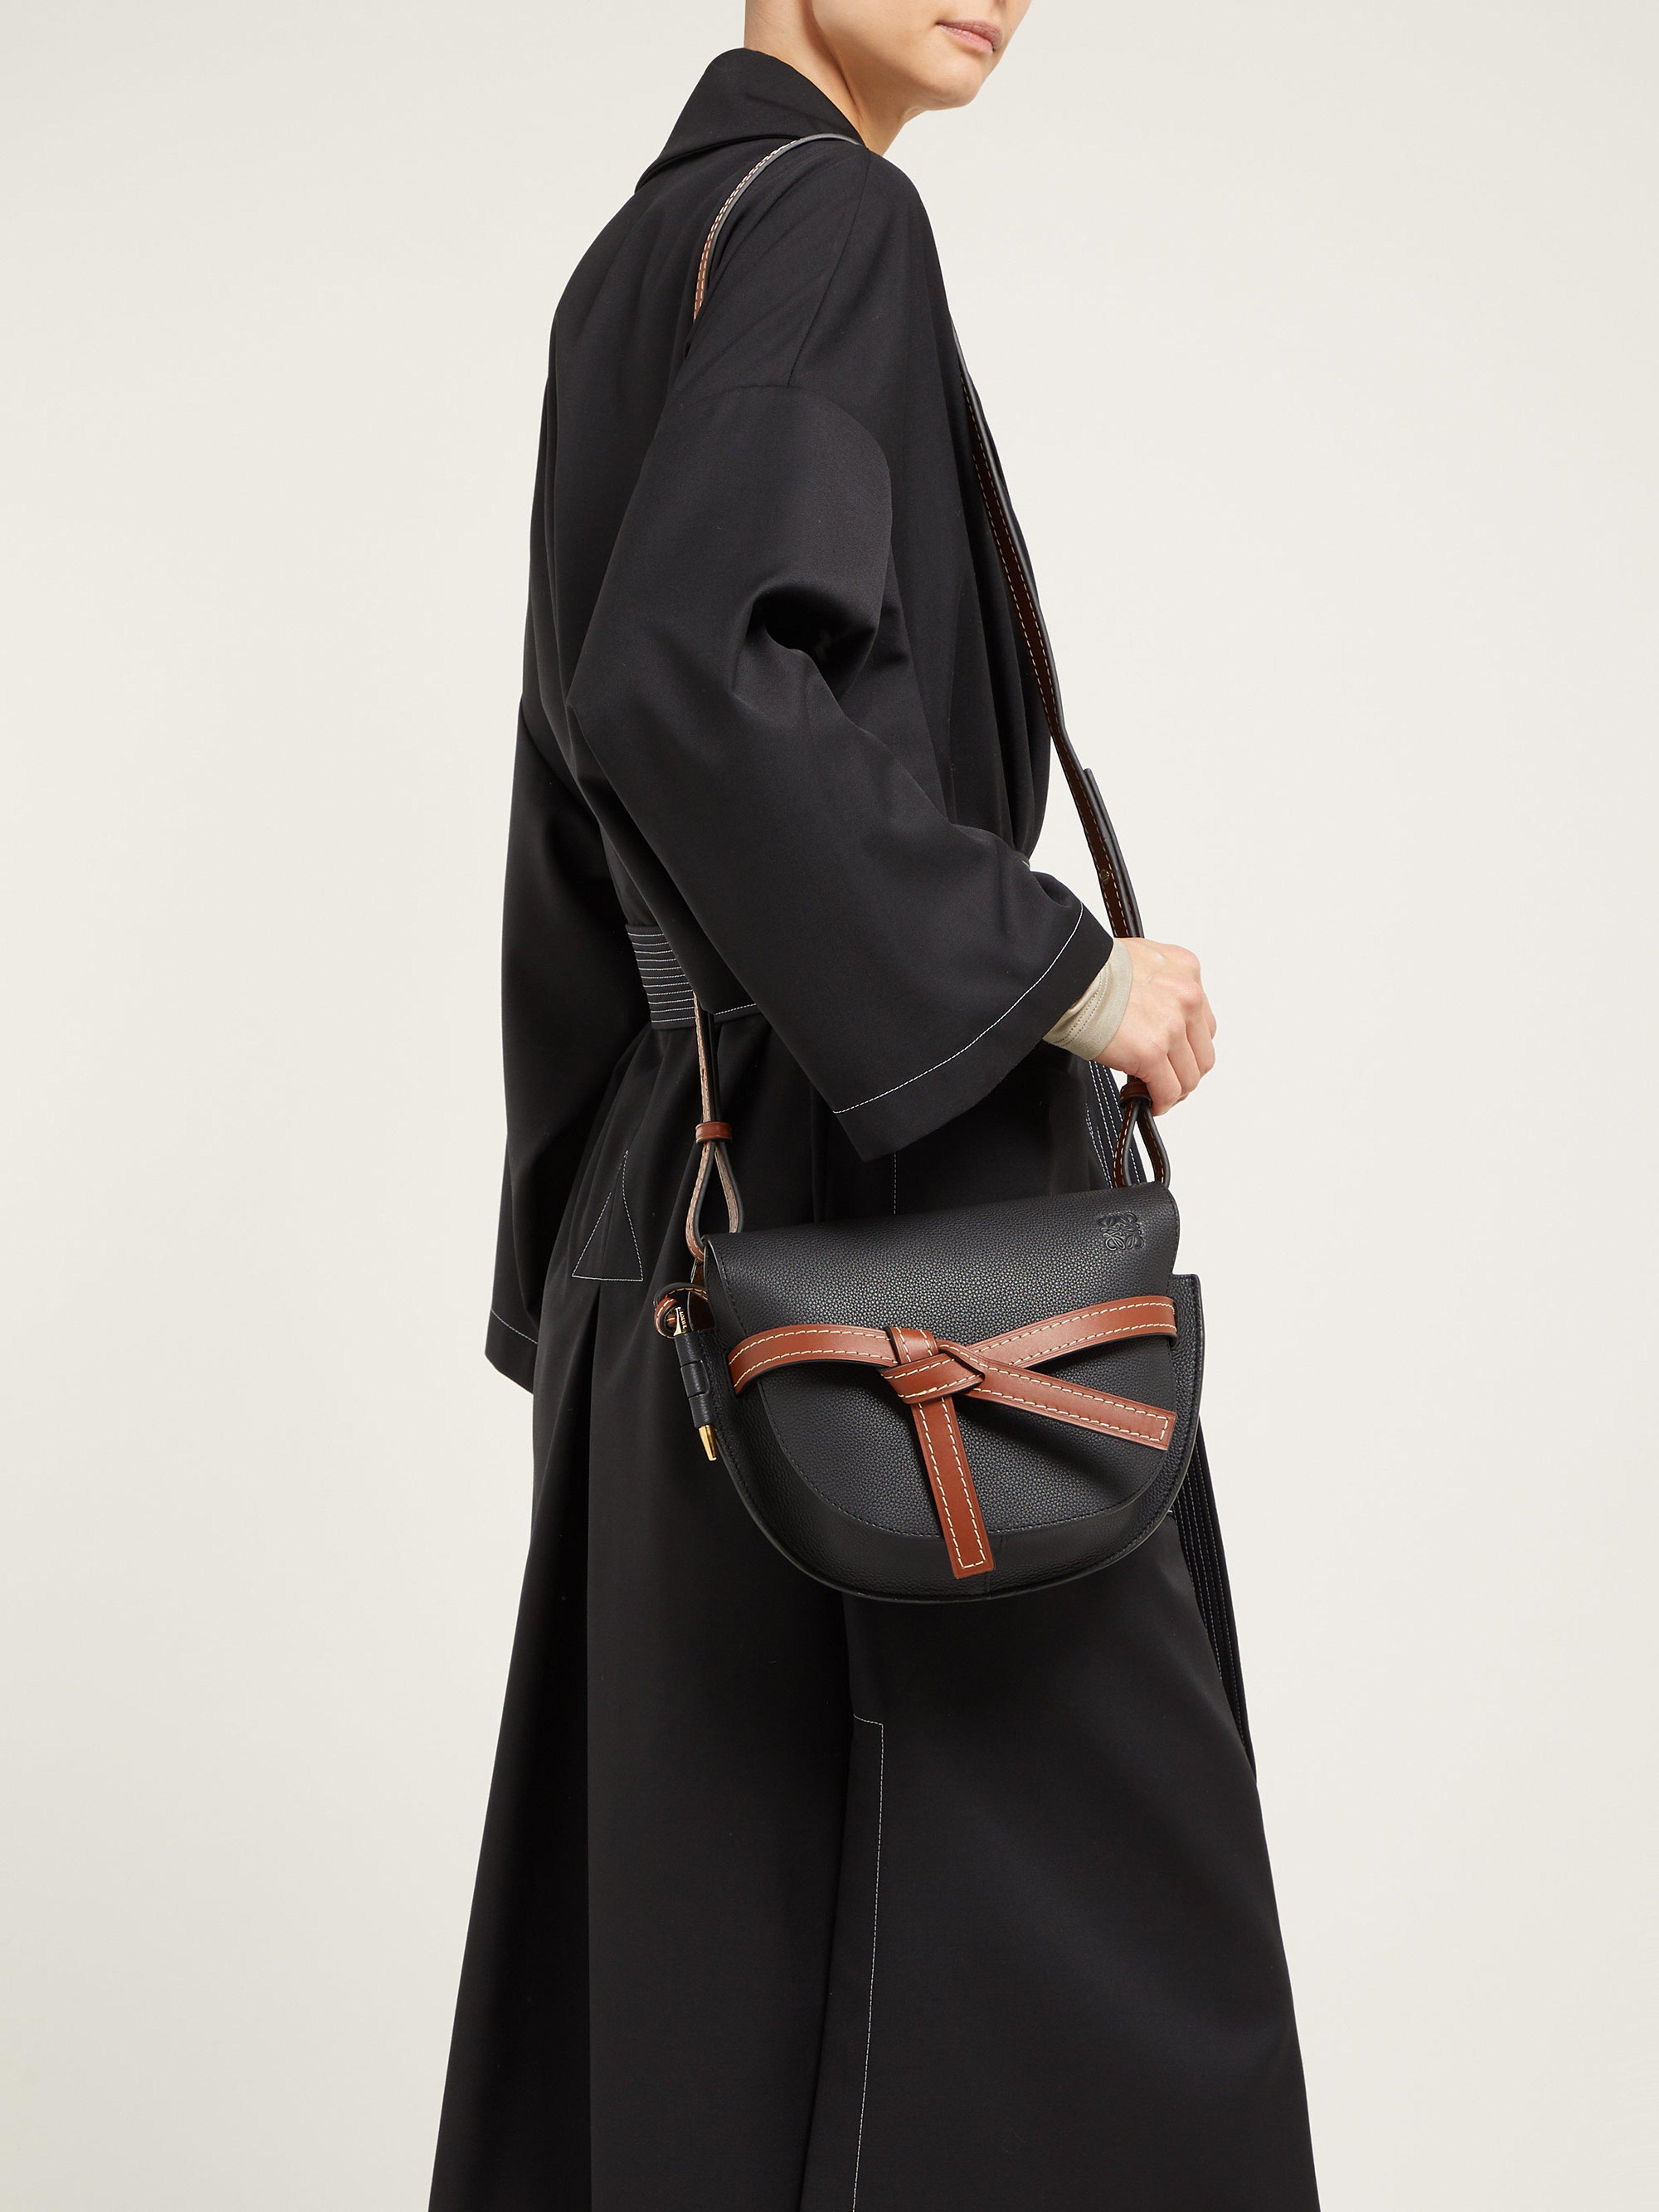 35333c33ee2 Loewe Gate Small Grained Leather Cross Body Bag in Black - Lyst